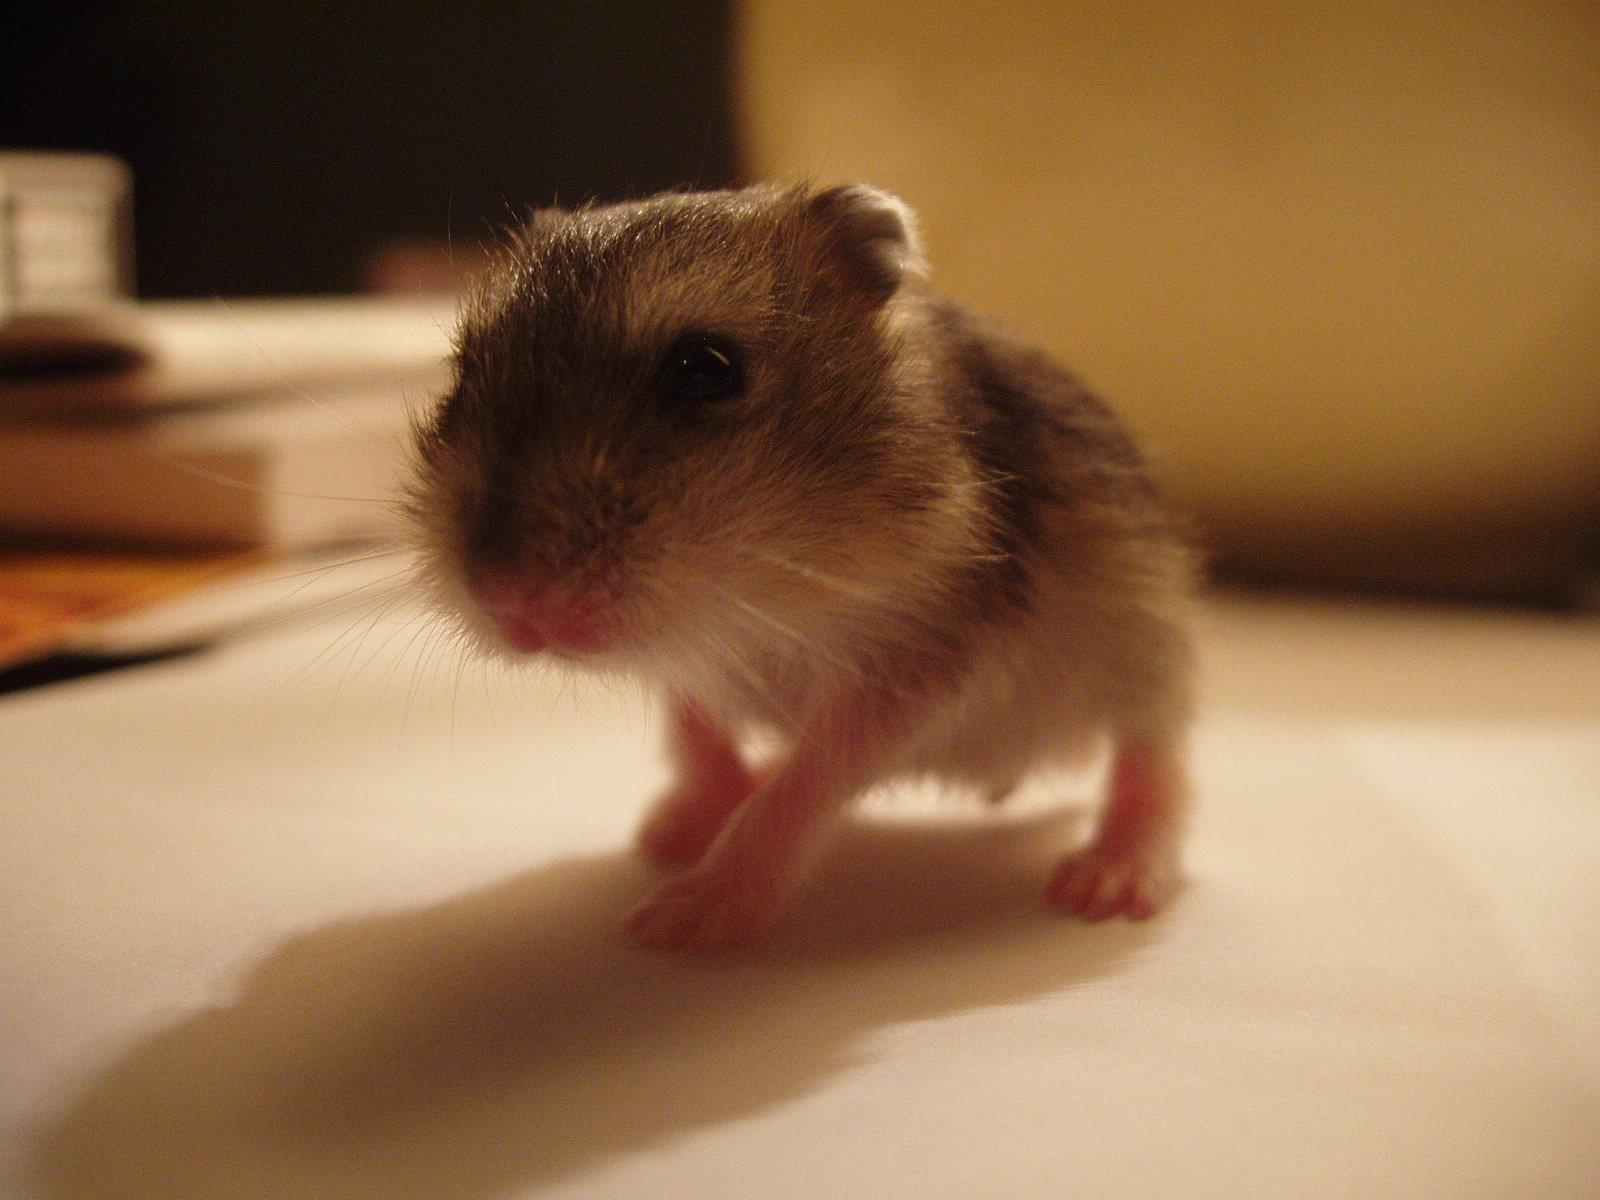 Cute Hamster Walk Alone Wallpaper Wallpaper ME 1600x1200